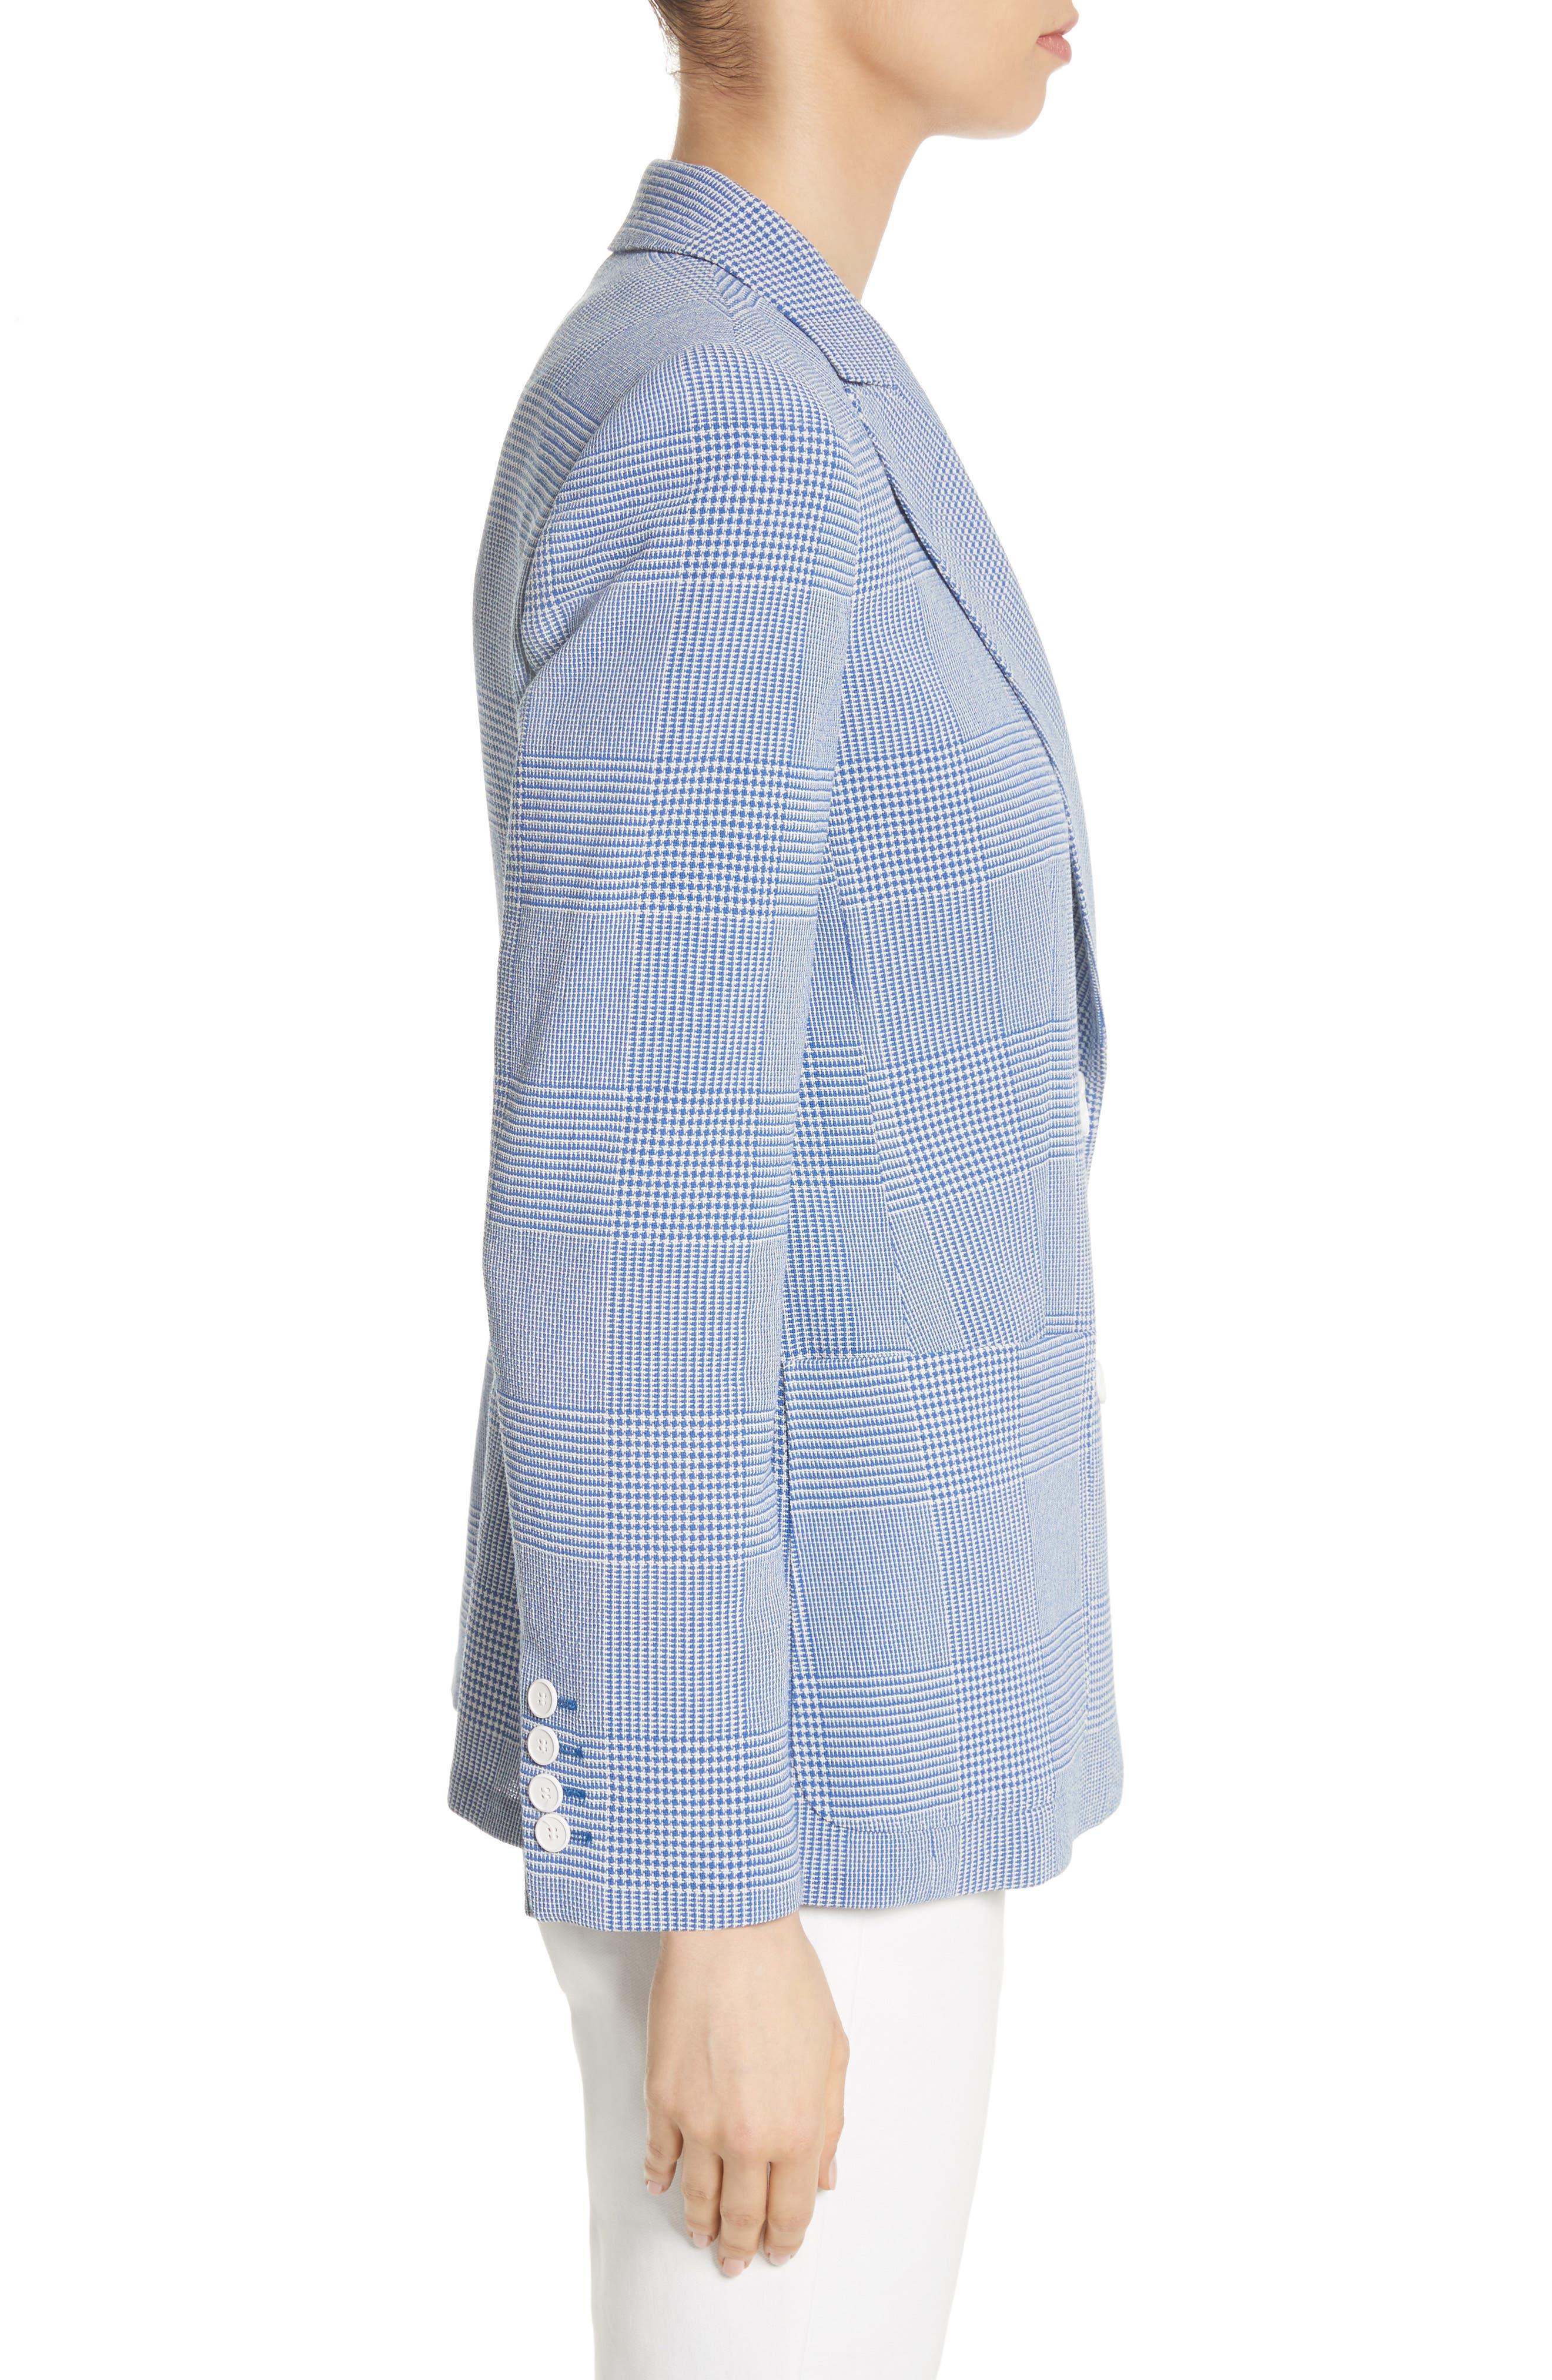 Ballata Check Wool Blazer,                             Alternate thumbnail 3, color,                             404